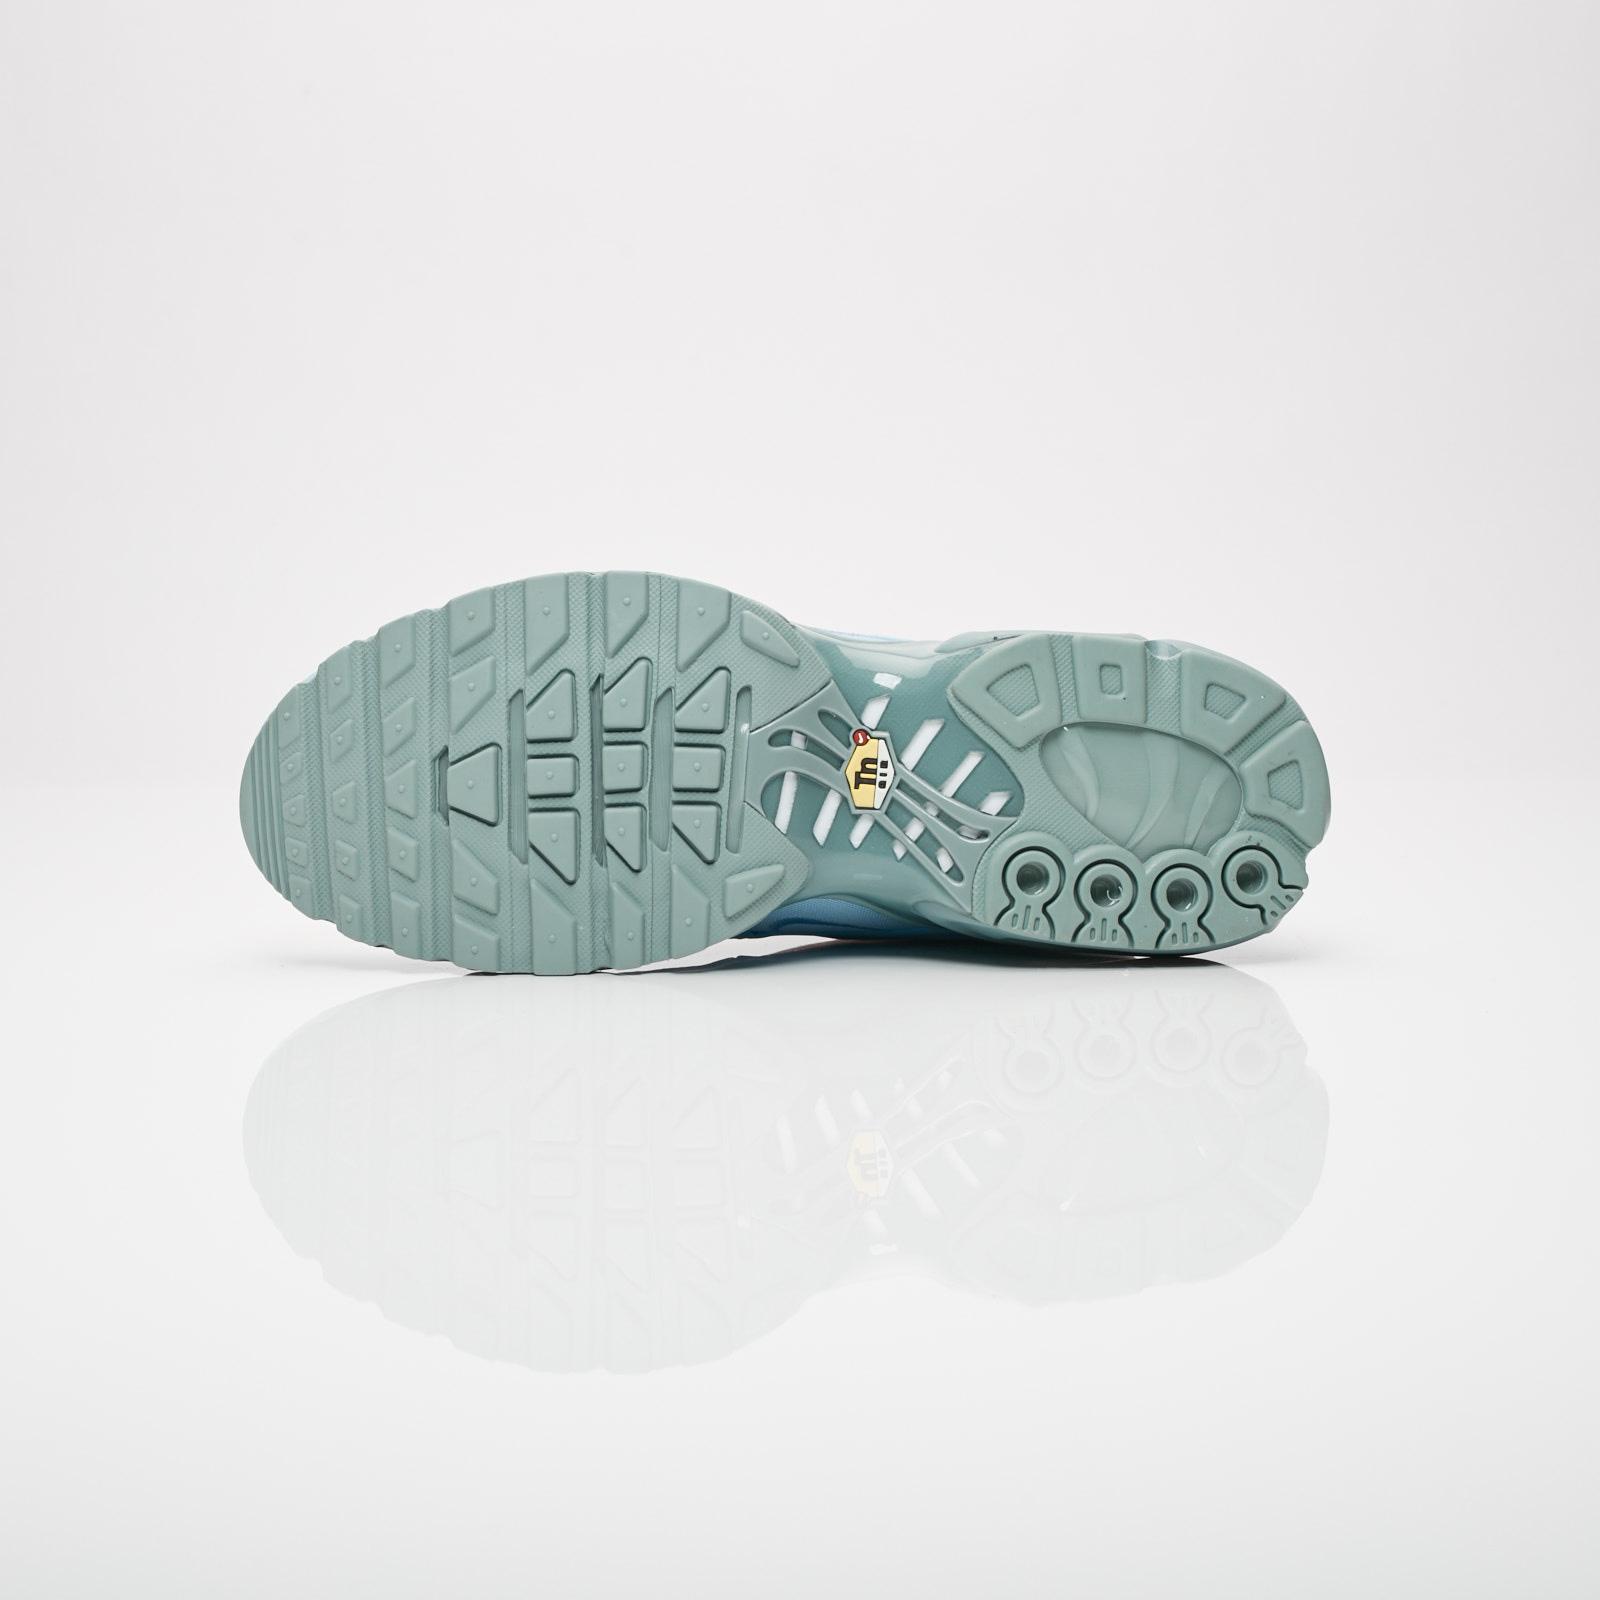 be214494e4f8d Nike Air Max Plus   97 - Ah8143-300 - Sneakersnstuff